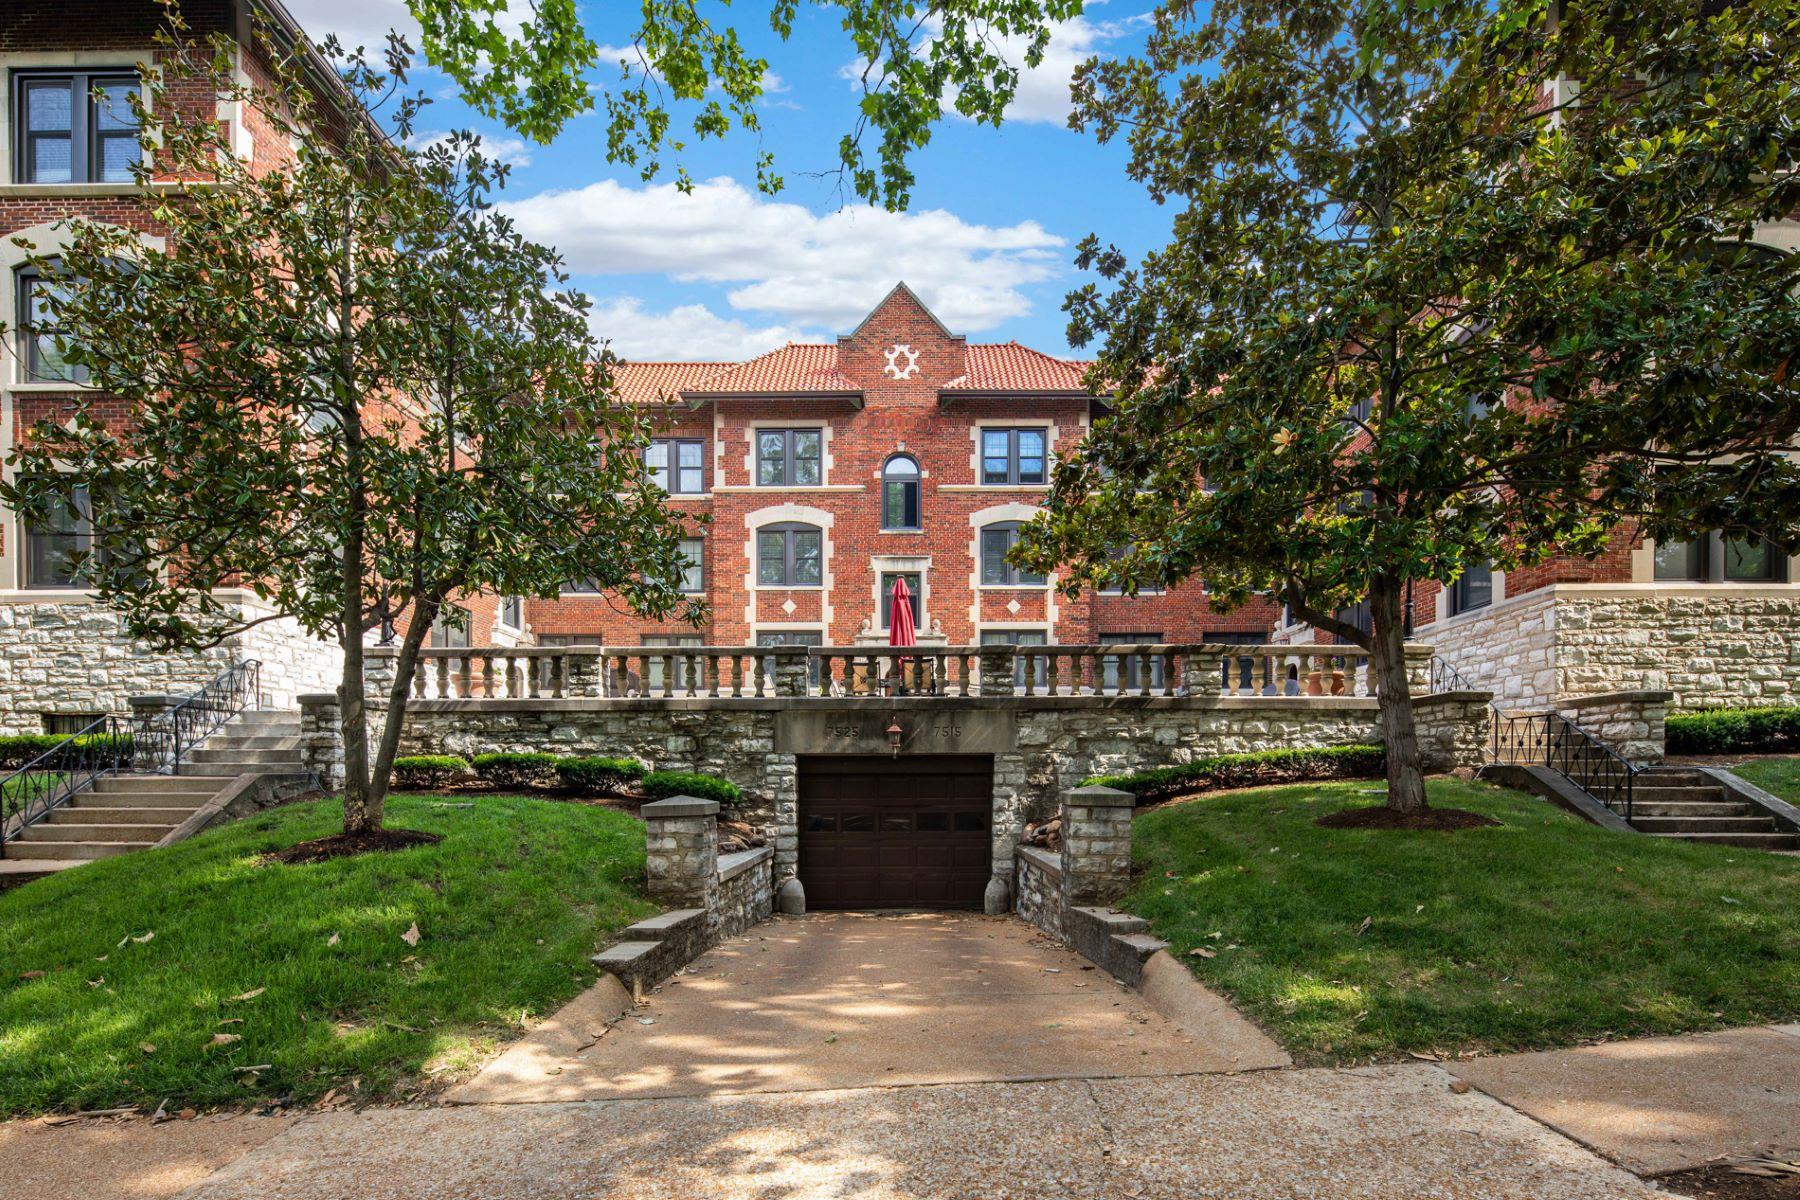 Condominium for Sale at Buckingham Dr 7525 Buckingham Dr # 1N St. Louis, Missouri 63105 United States